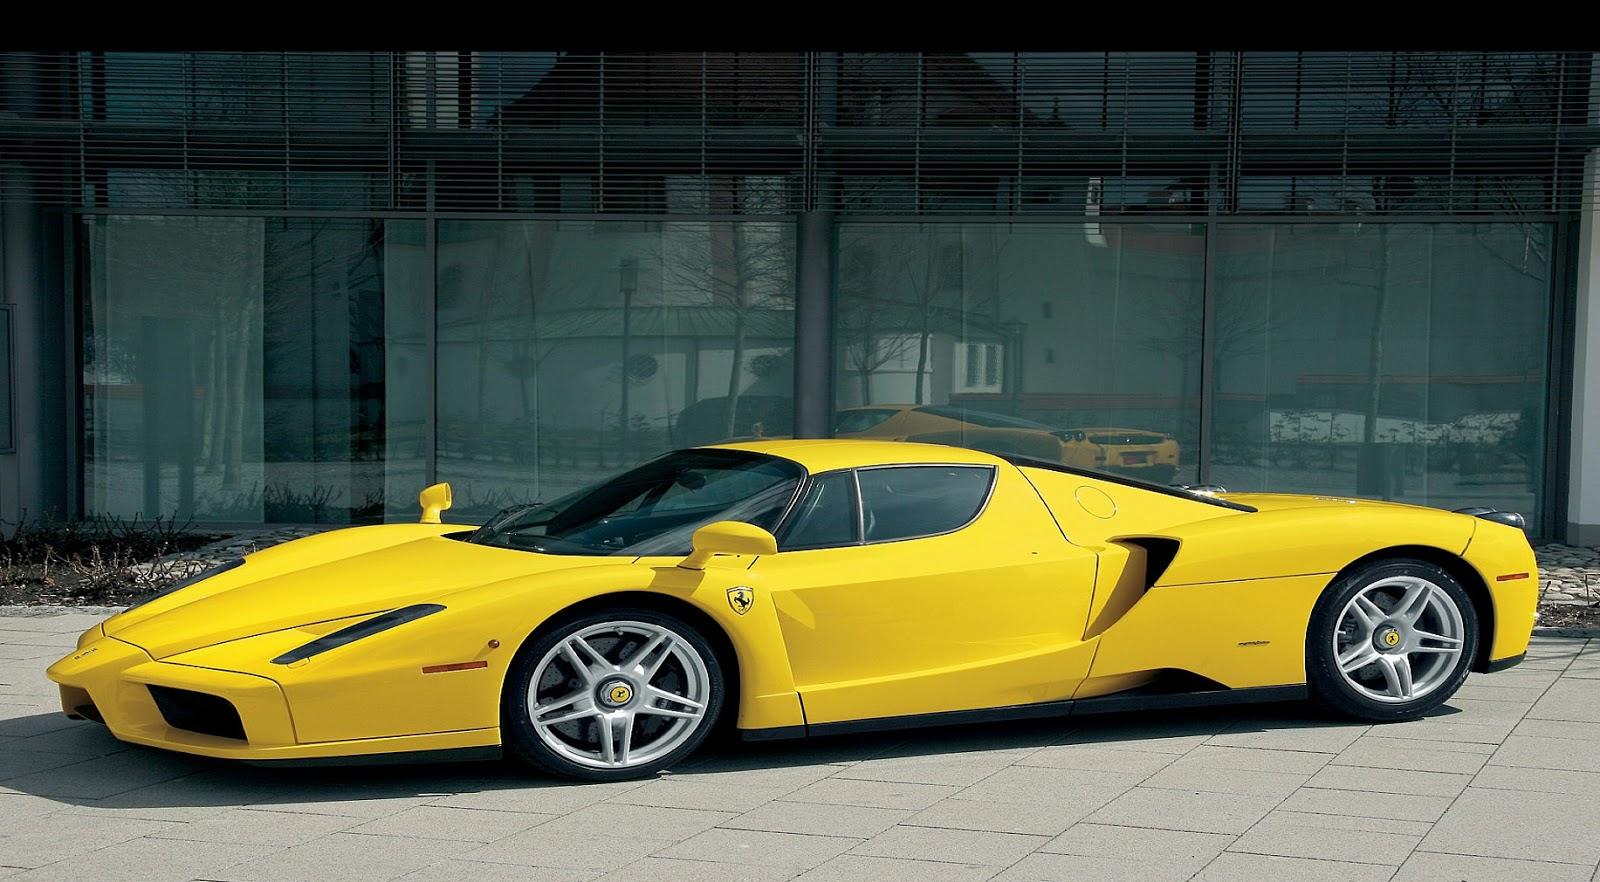 Sports Cars Latest HD Wallpaper 2013 | World HD Wallpapers